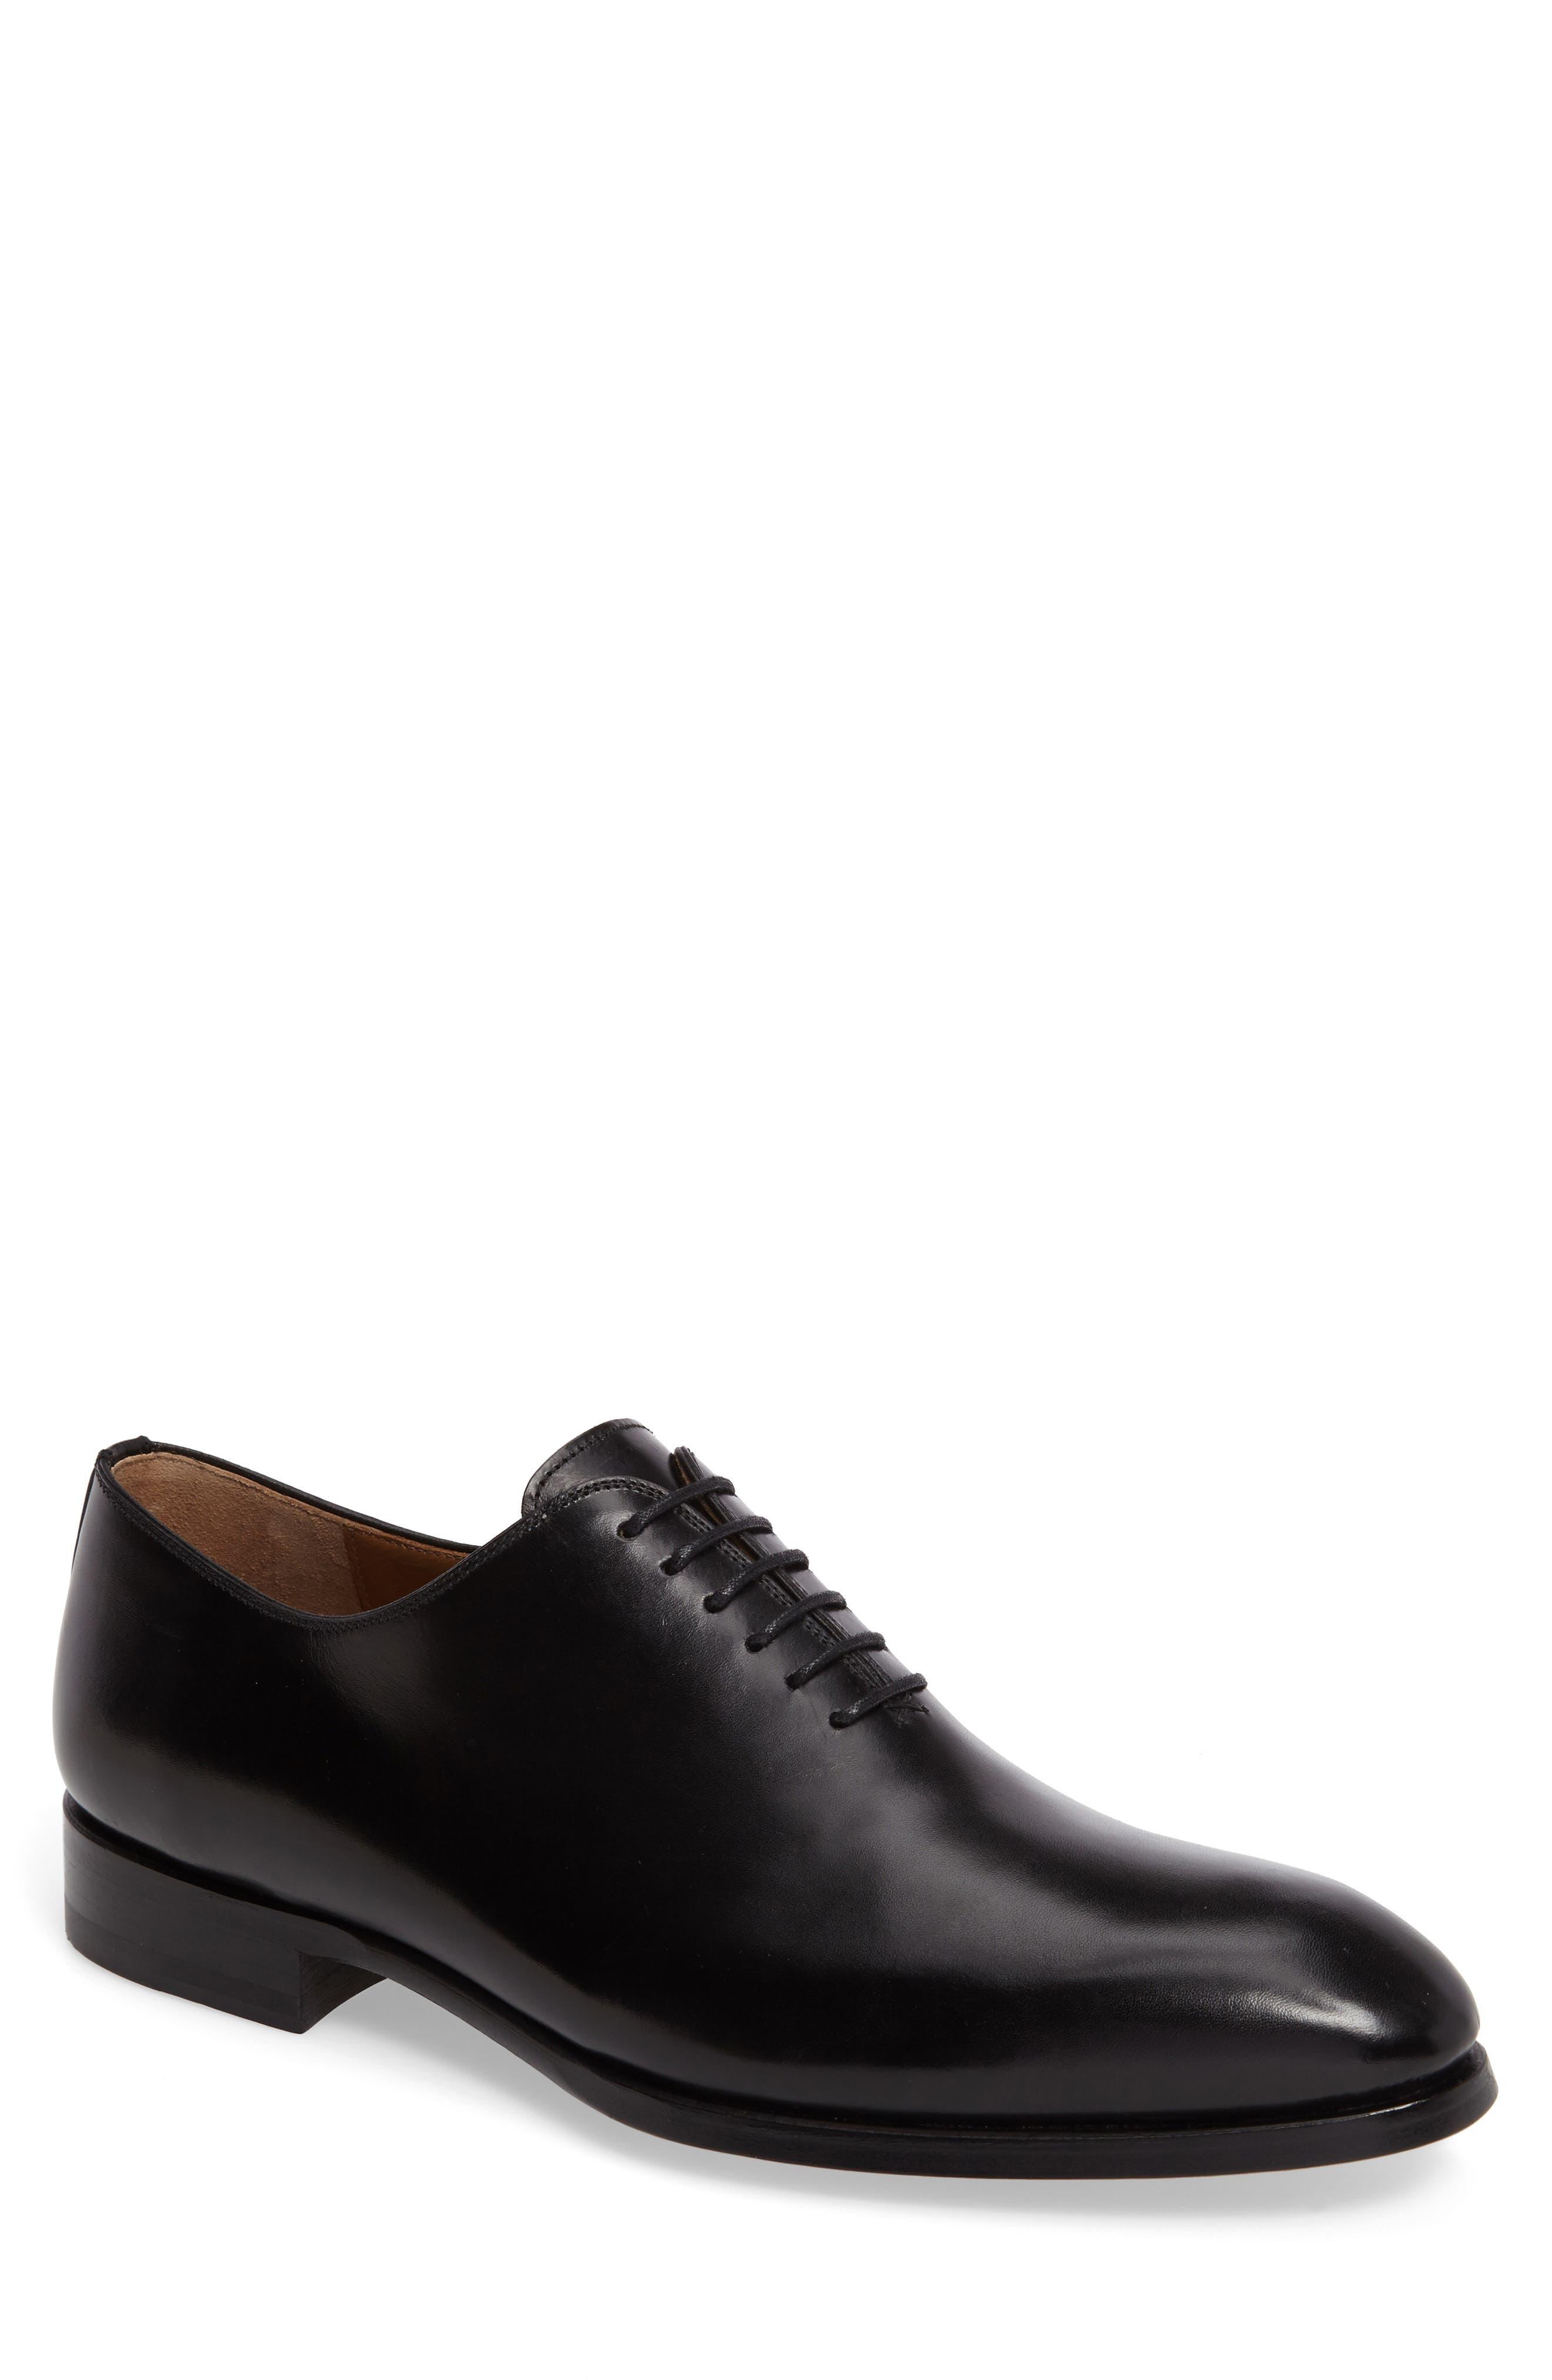 MAGNANNI Flex Wholecut Leather Oxford Shoes in Black